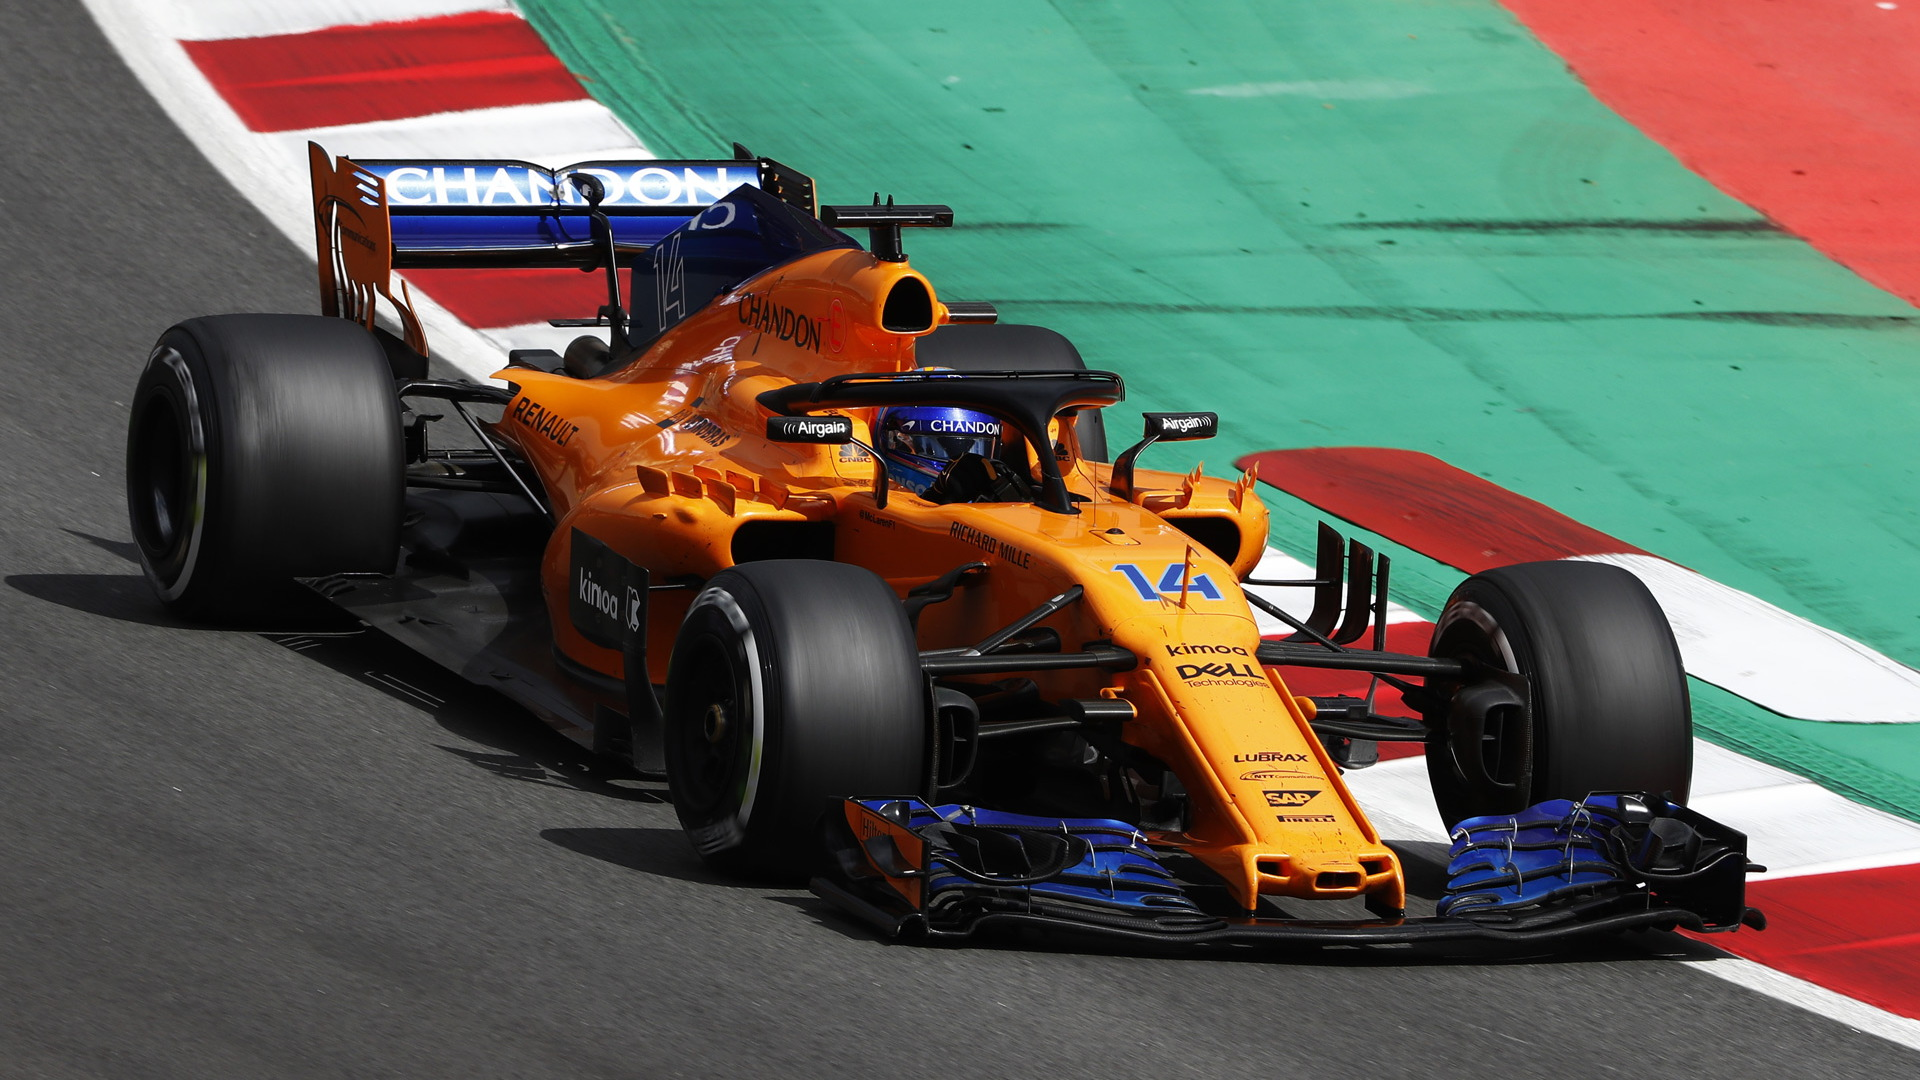 McLaren at the 2018 Formula 1 Spanish Grand Prix